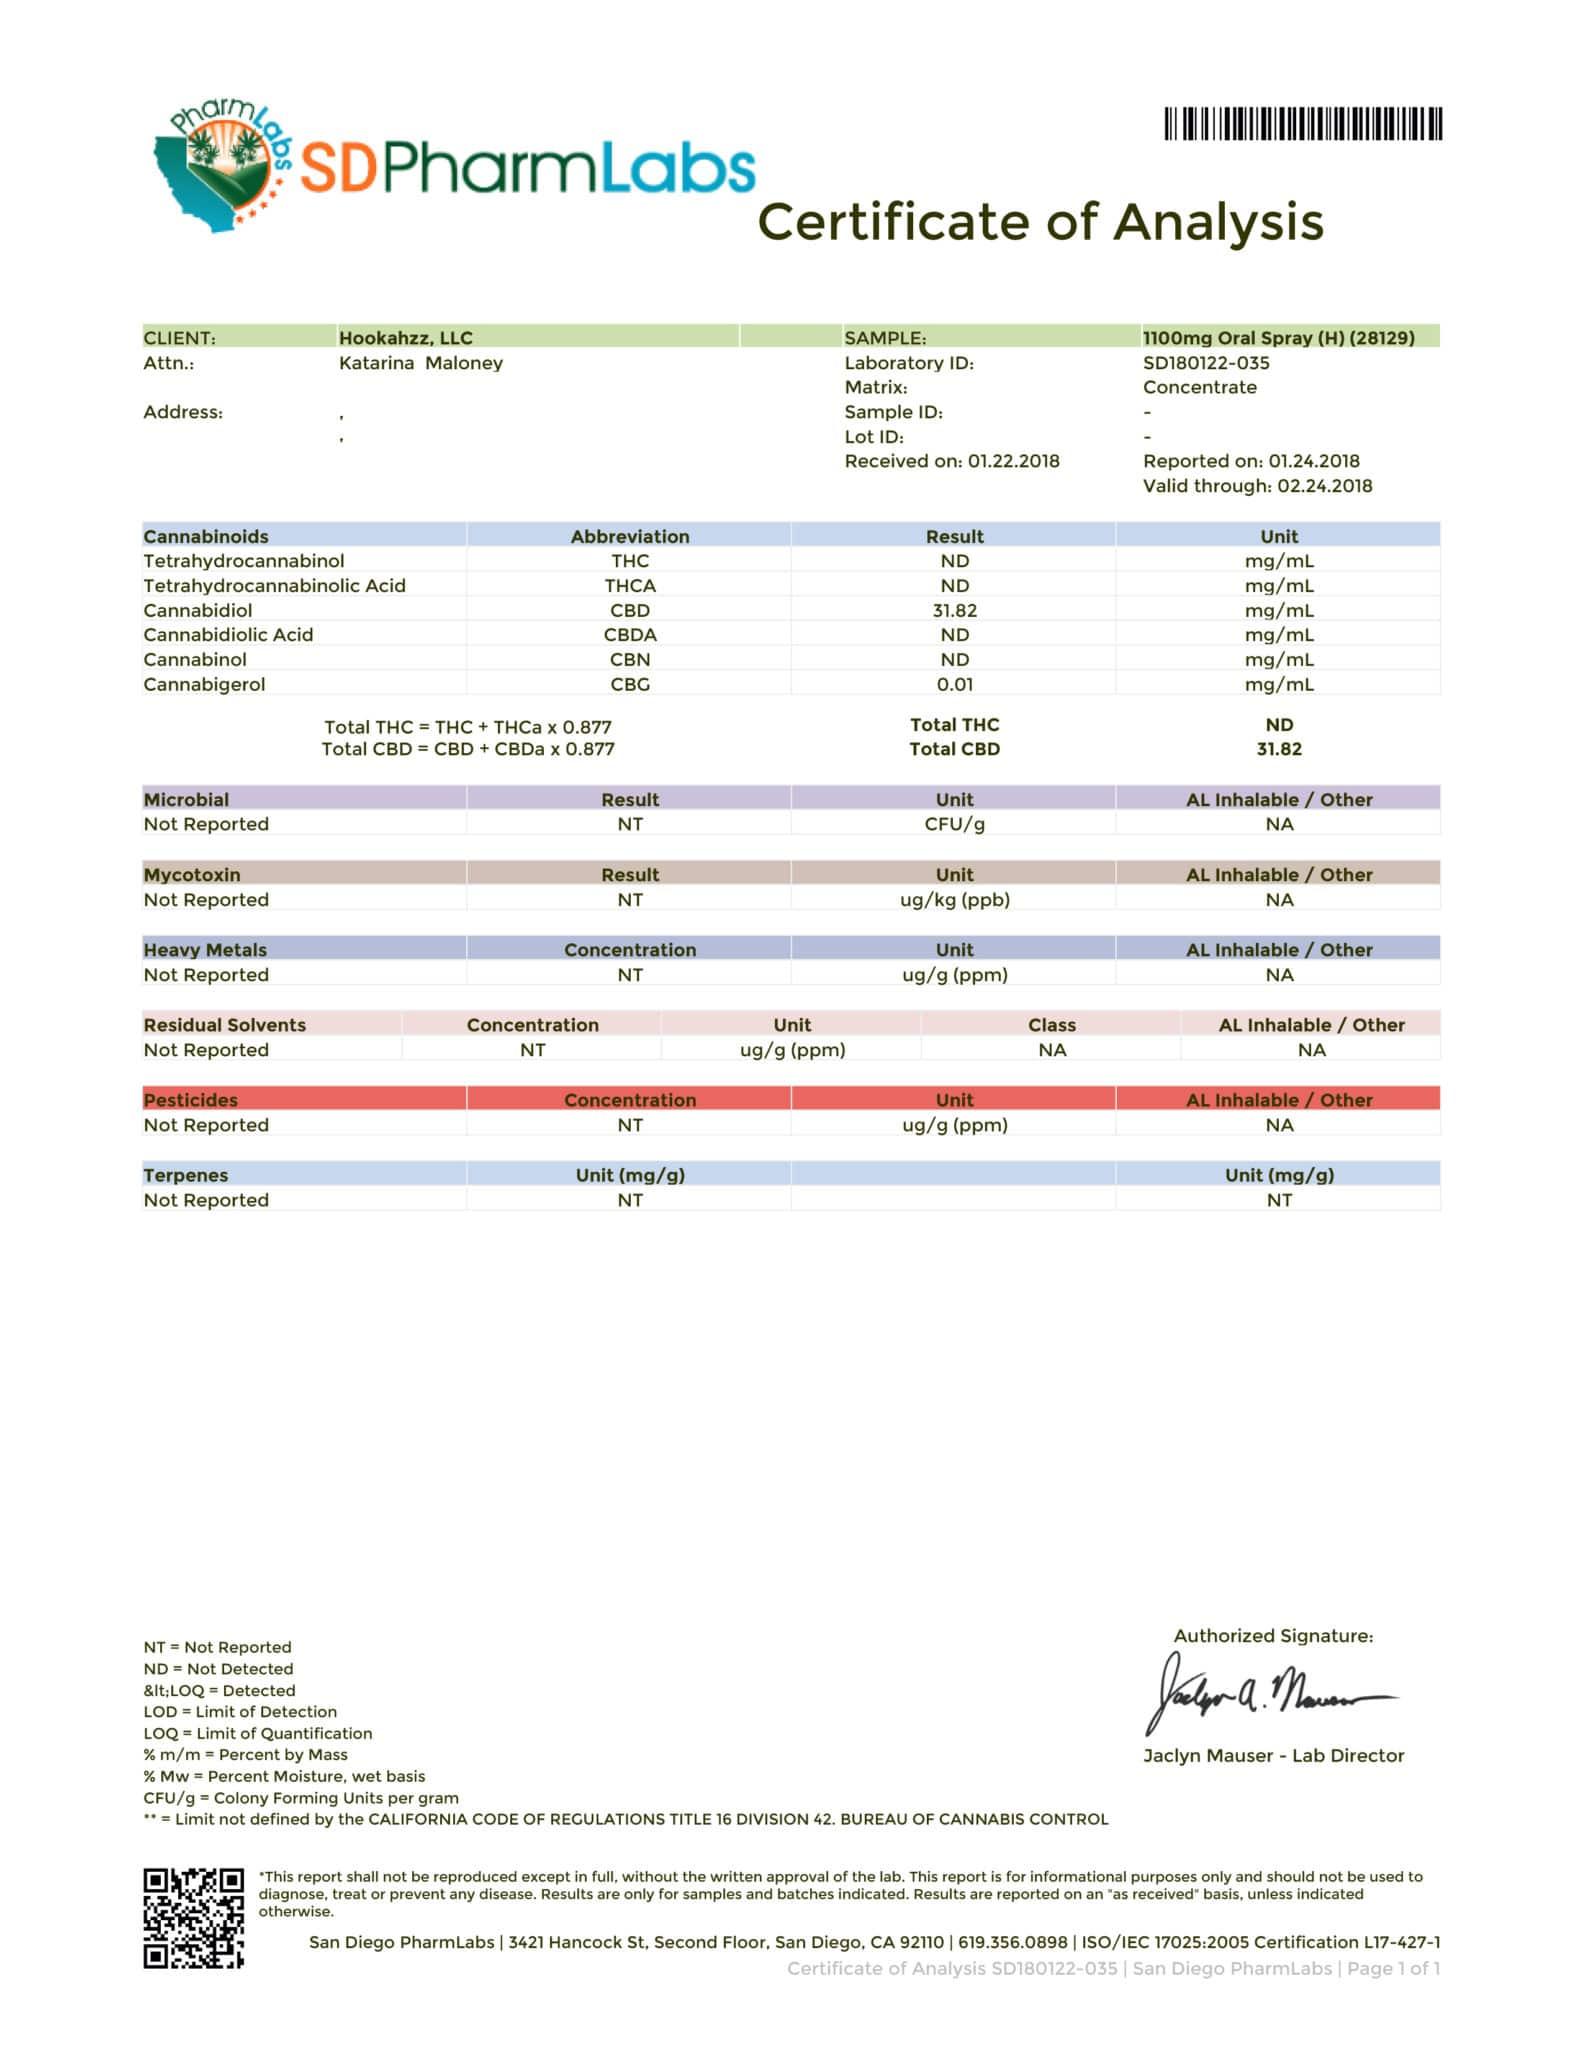 HEAL 1100MG 1 24 18 SDPharmLabs